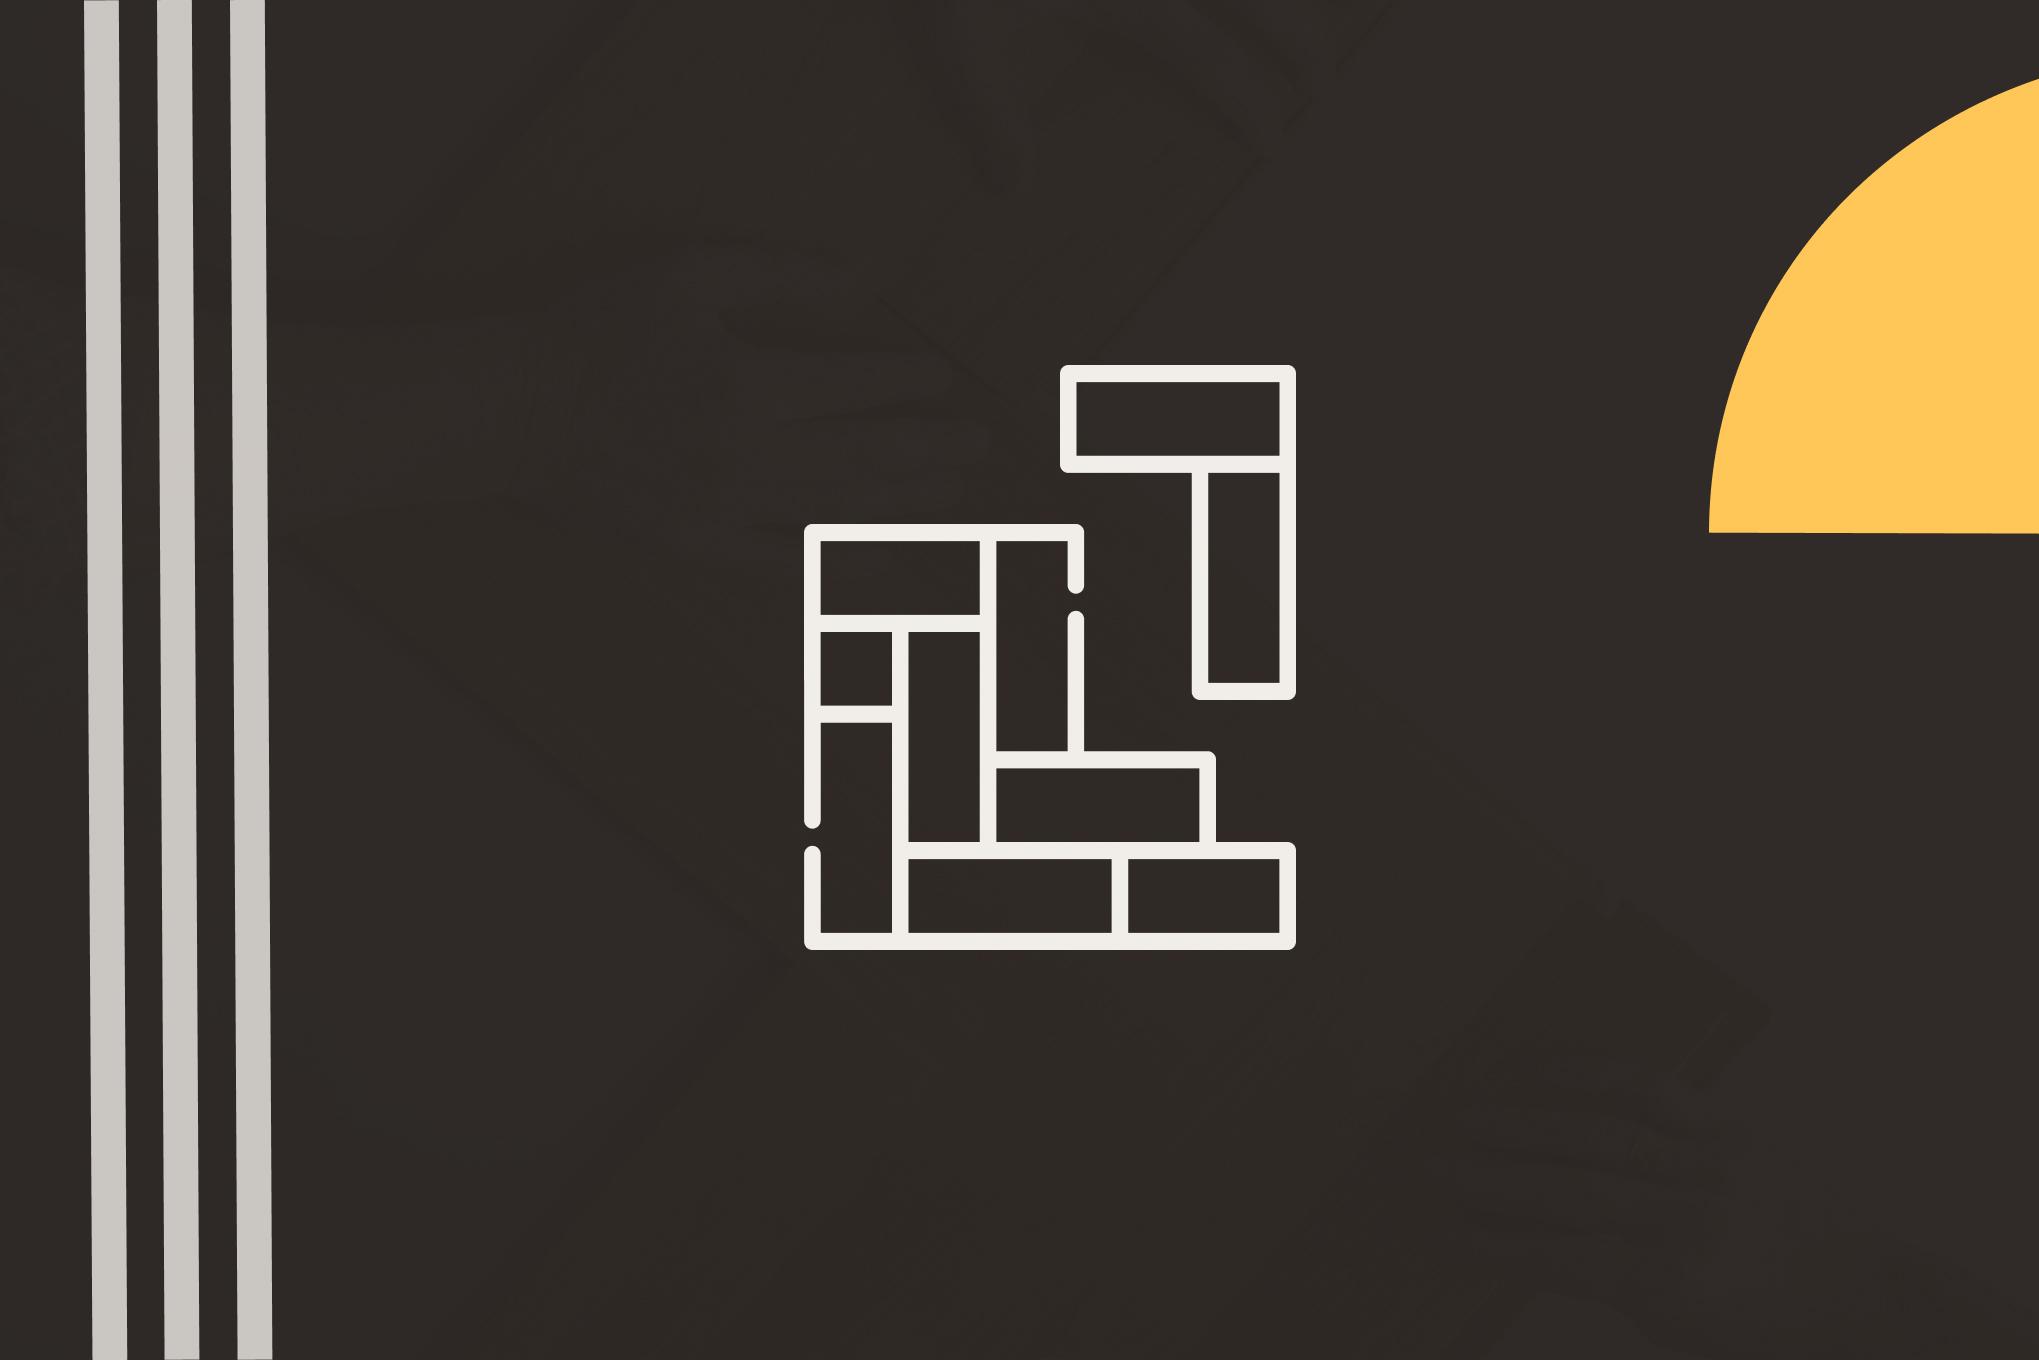 Ugradnja laminata CLICK sistemom